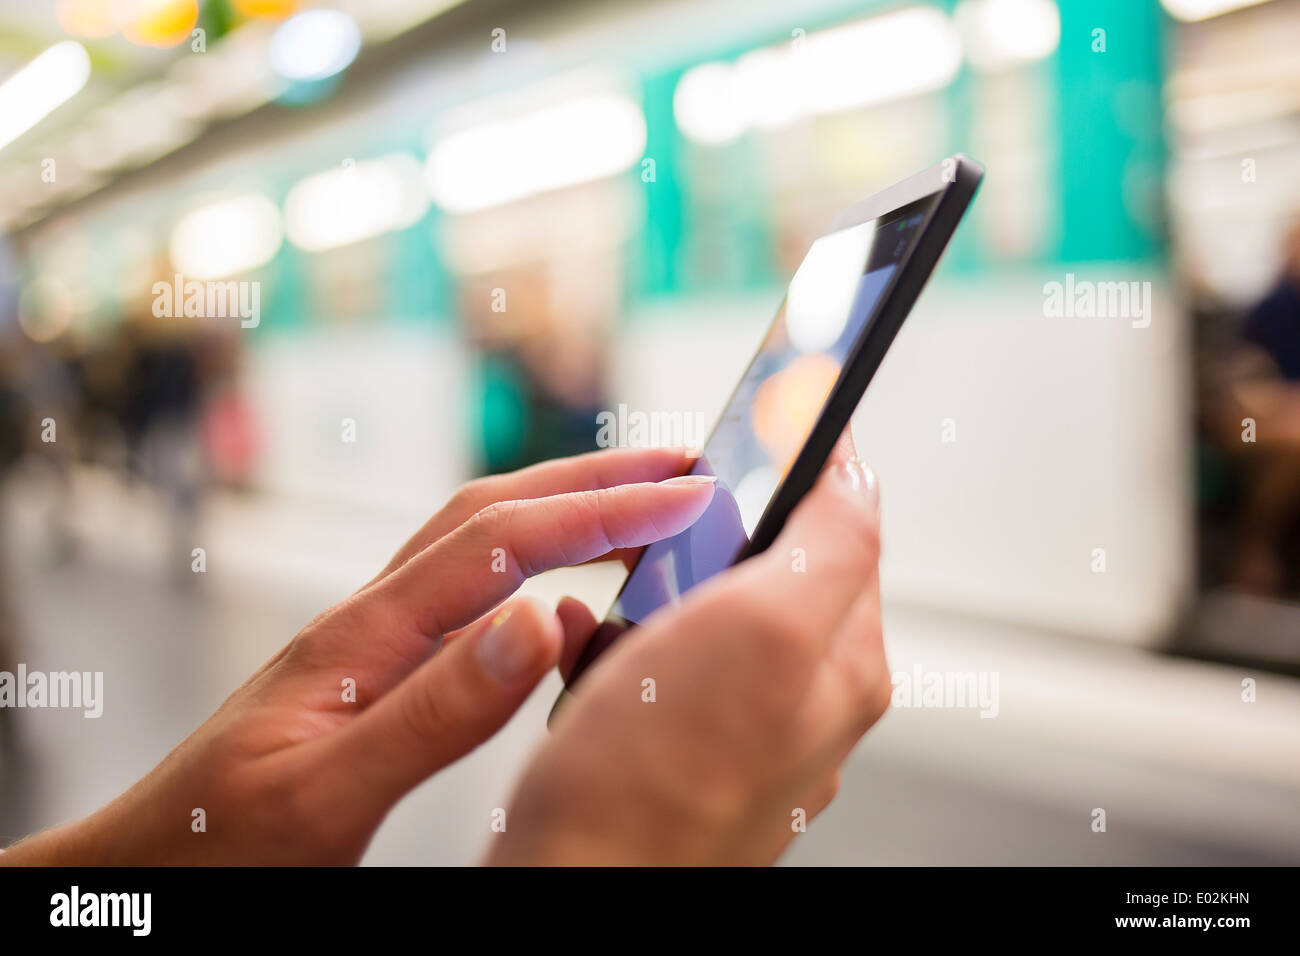 Female smartphone hand underground message sms e-mail - Stock Image